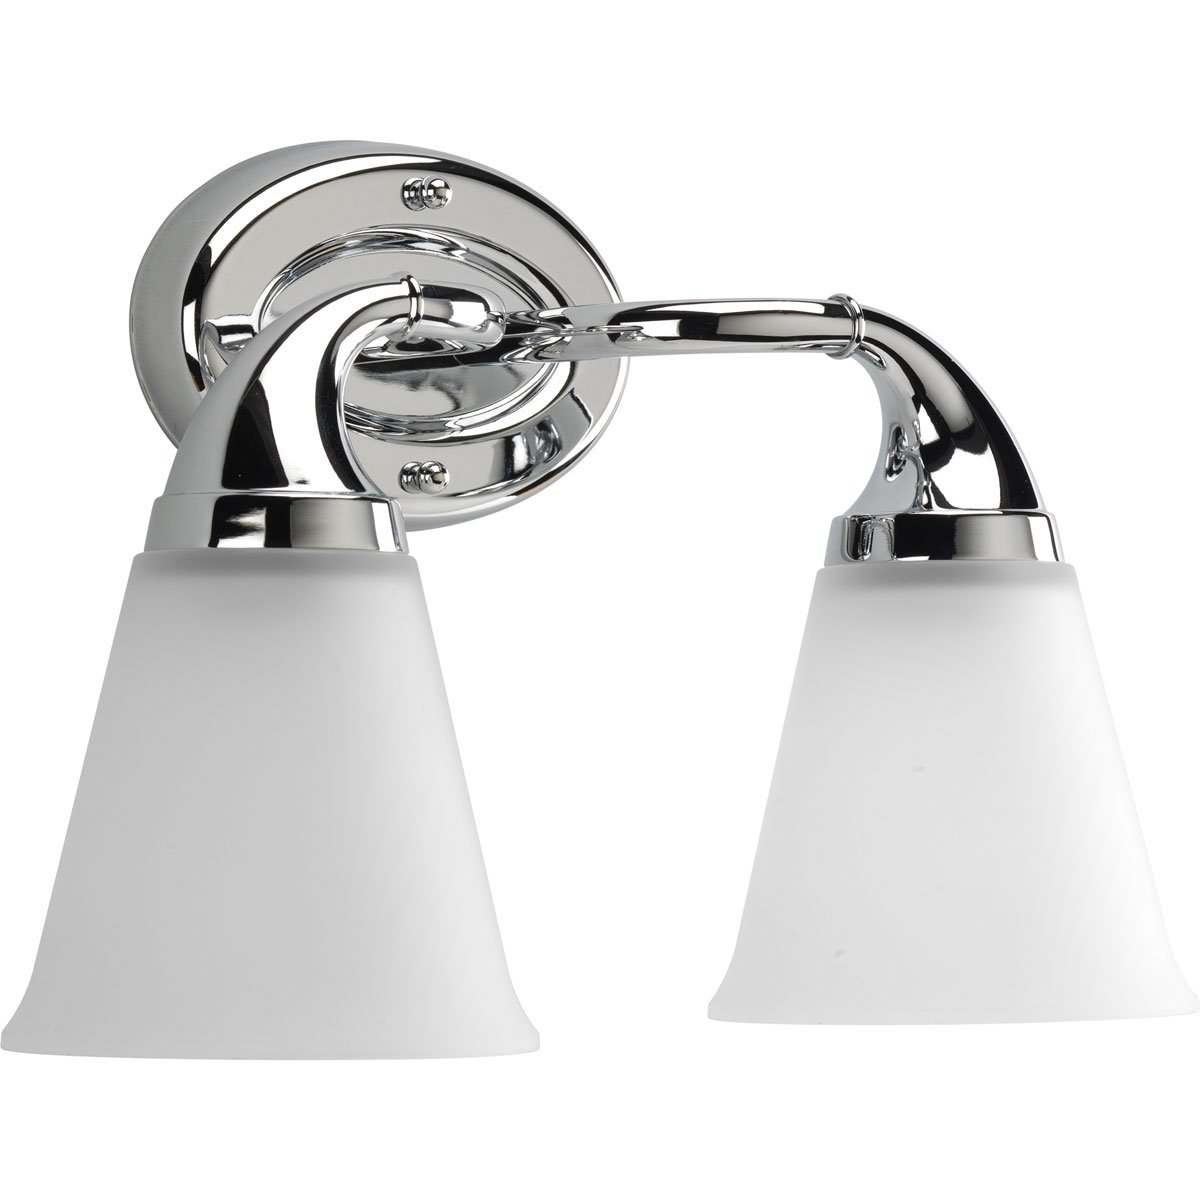 bathroom lighting fixtures photo 15. progress lighting p275915 2light bath which mounts up or down polished chrome vanity fixtures amazoncom bathroom photo 15